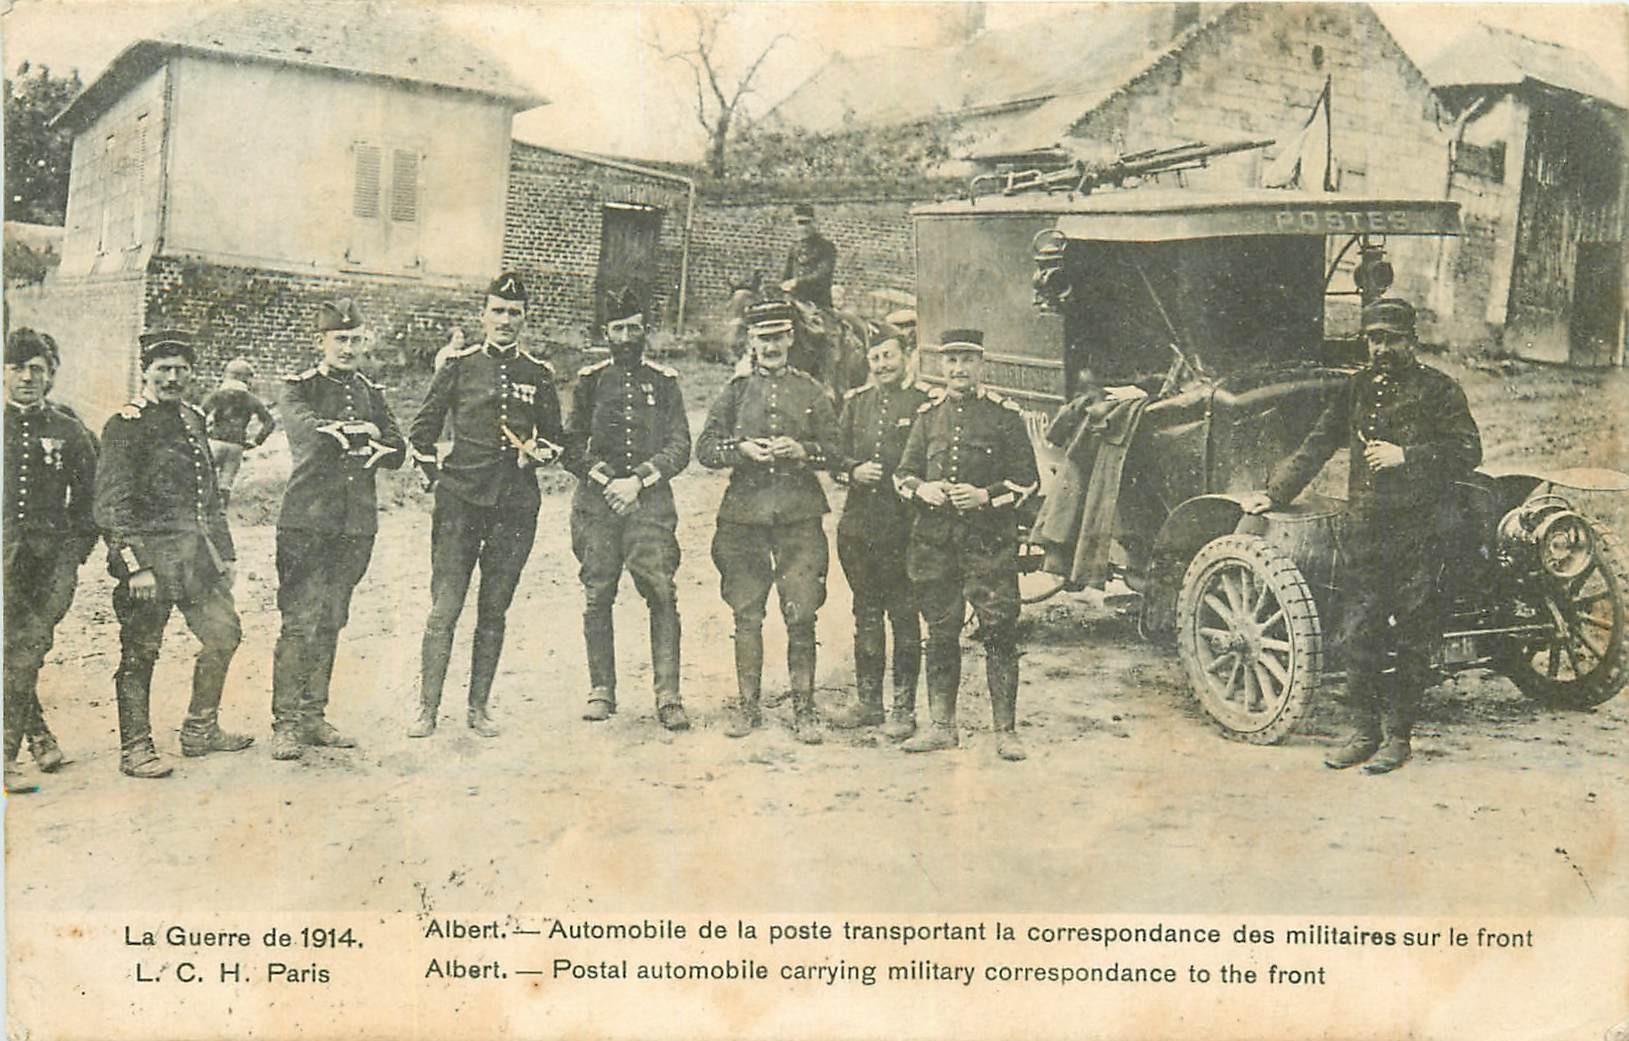 WW 80 ALBERT. Automobile transport poste et correspondance militaires 1915